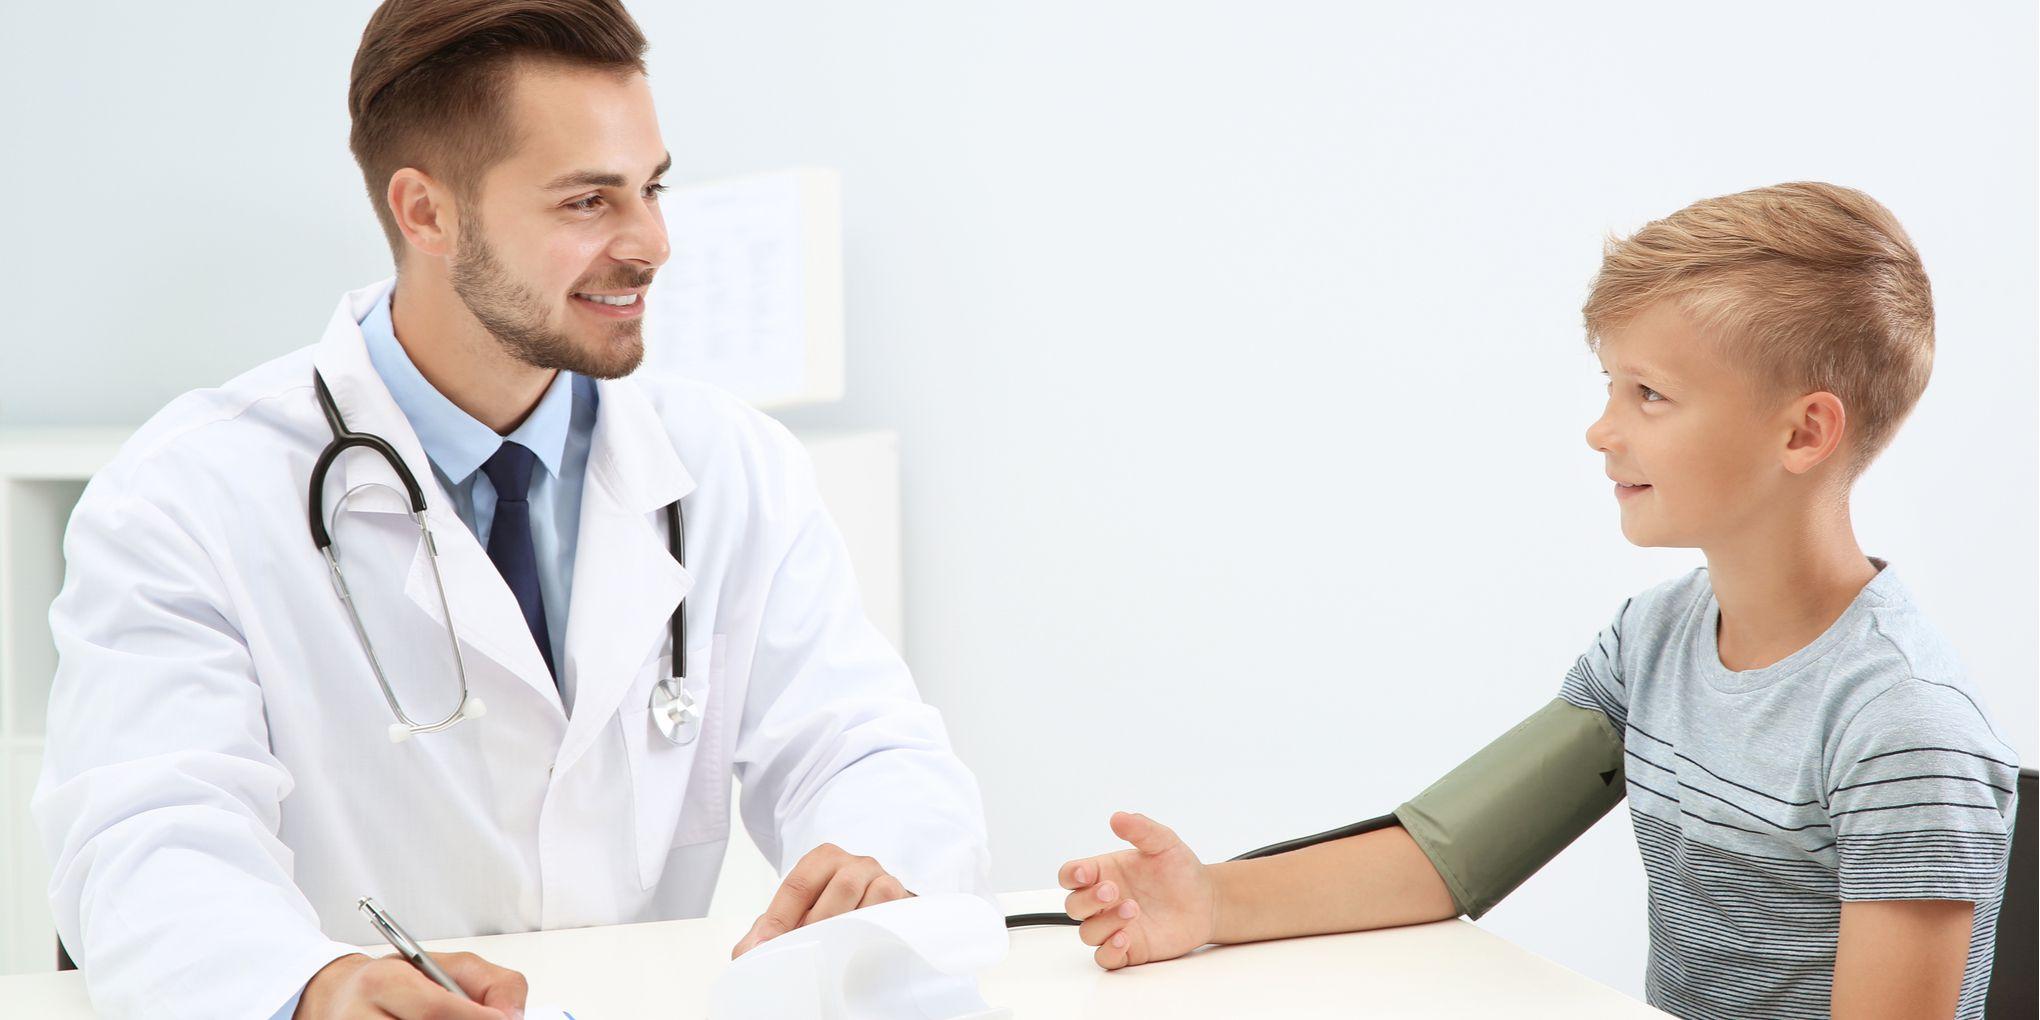 hipertenzija u adolescenata razloga